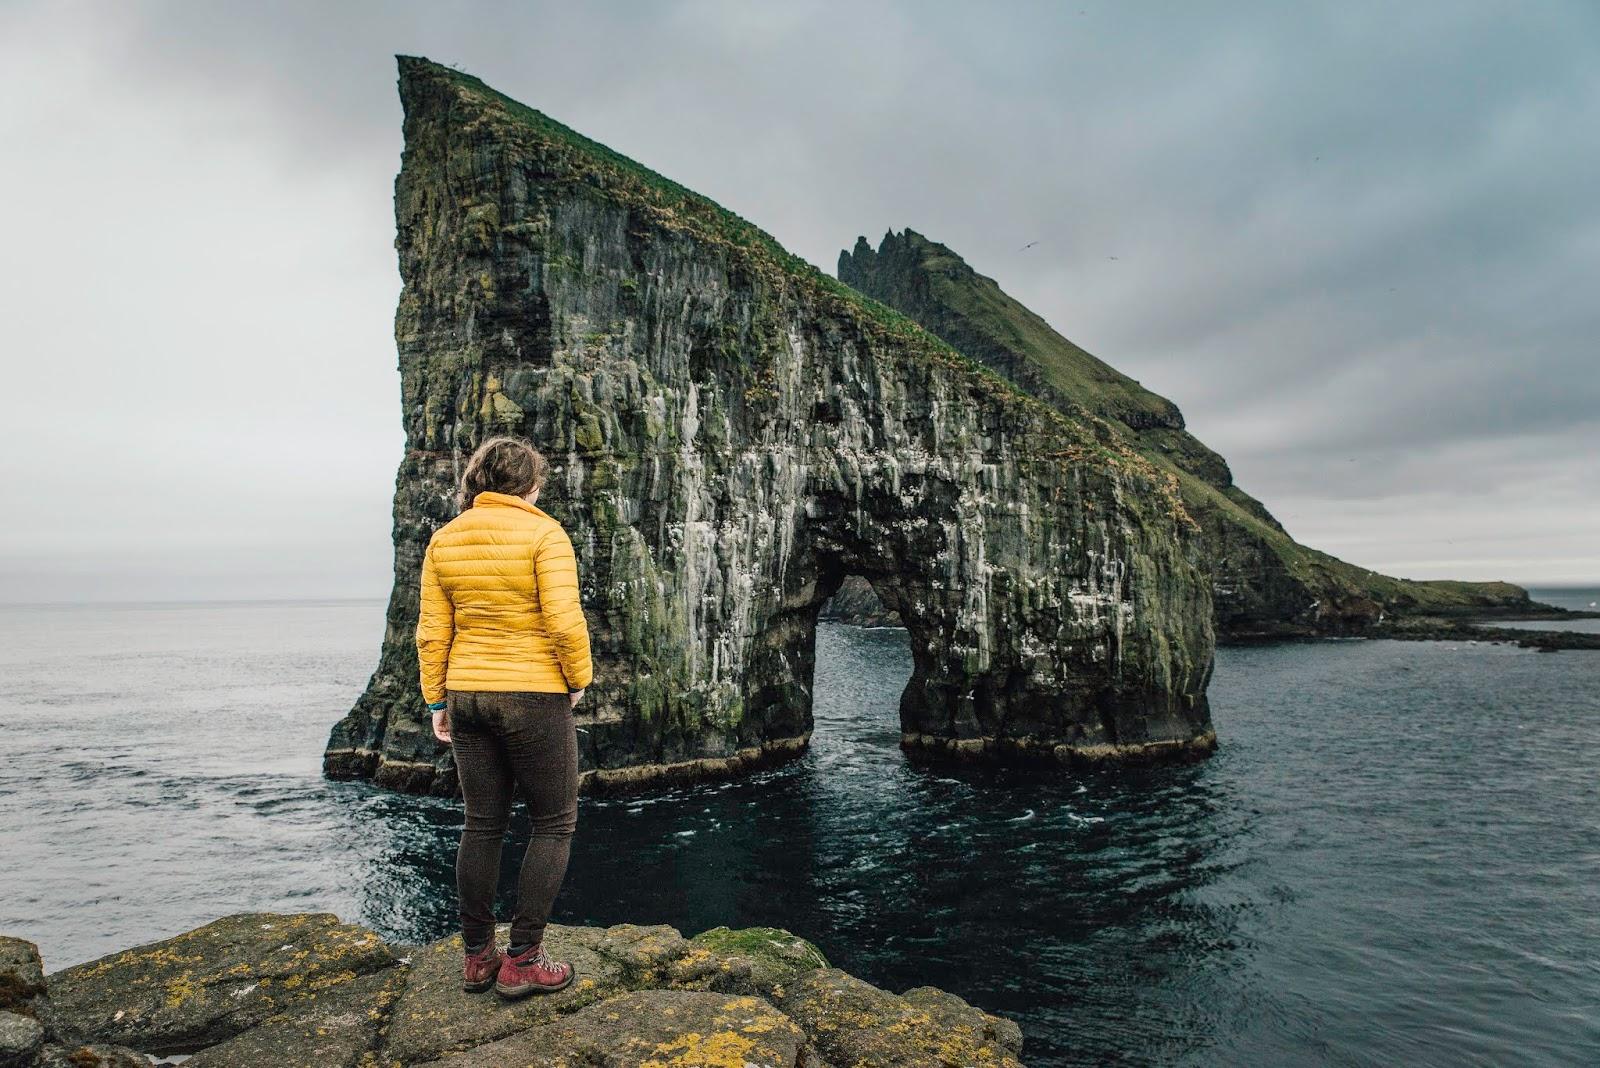 drangarnir sea stacks hike faroe islands liquid grain liquidgrain